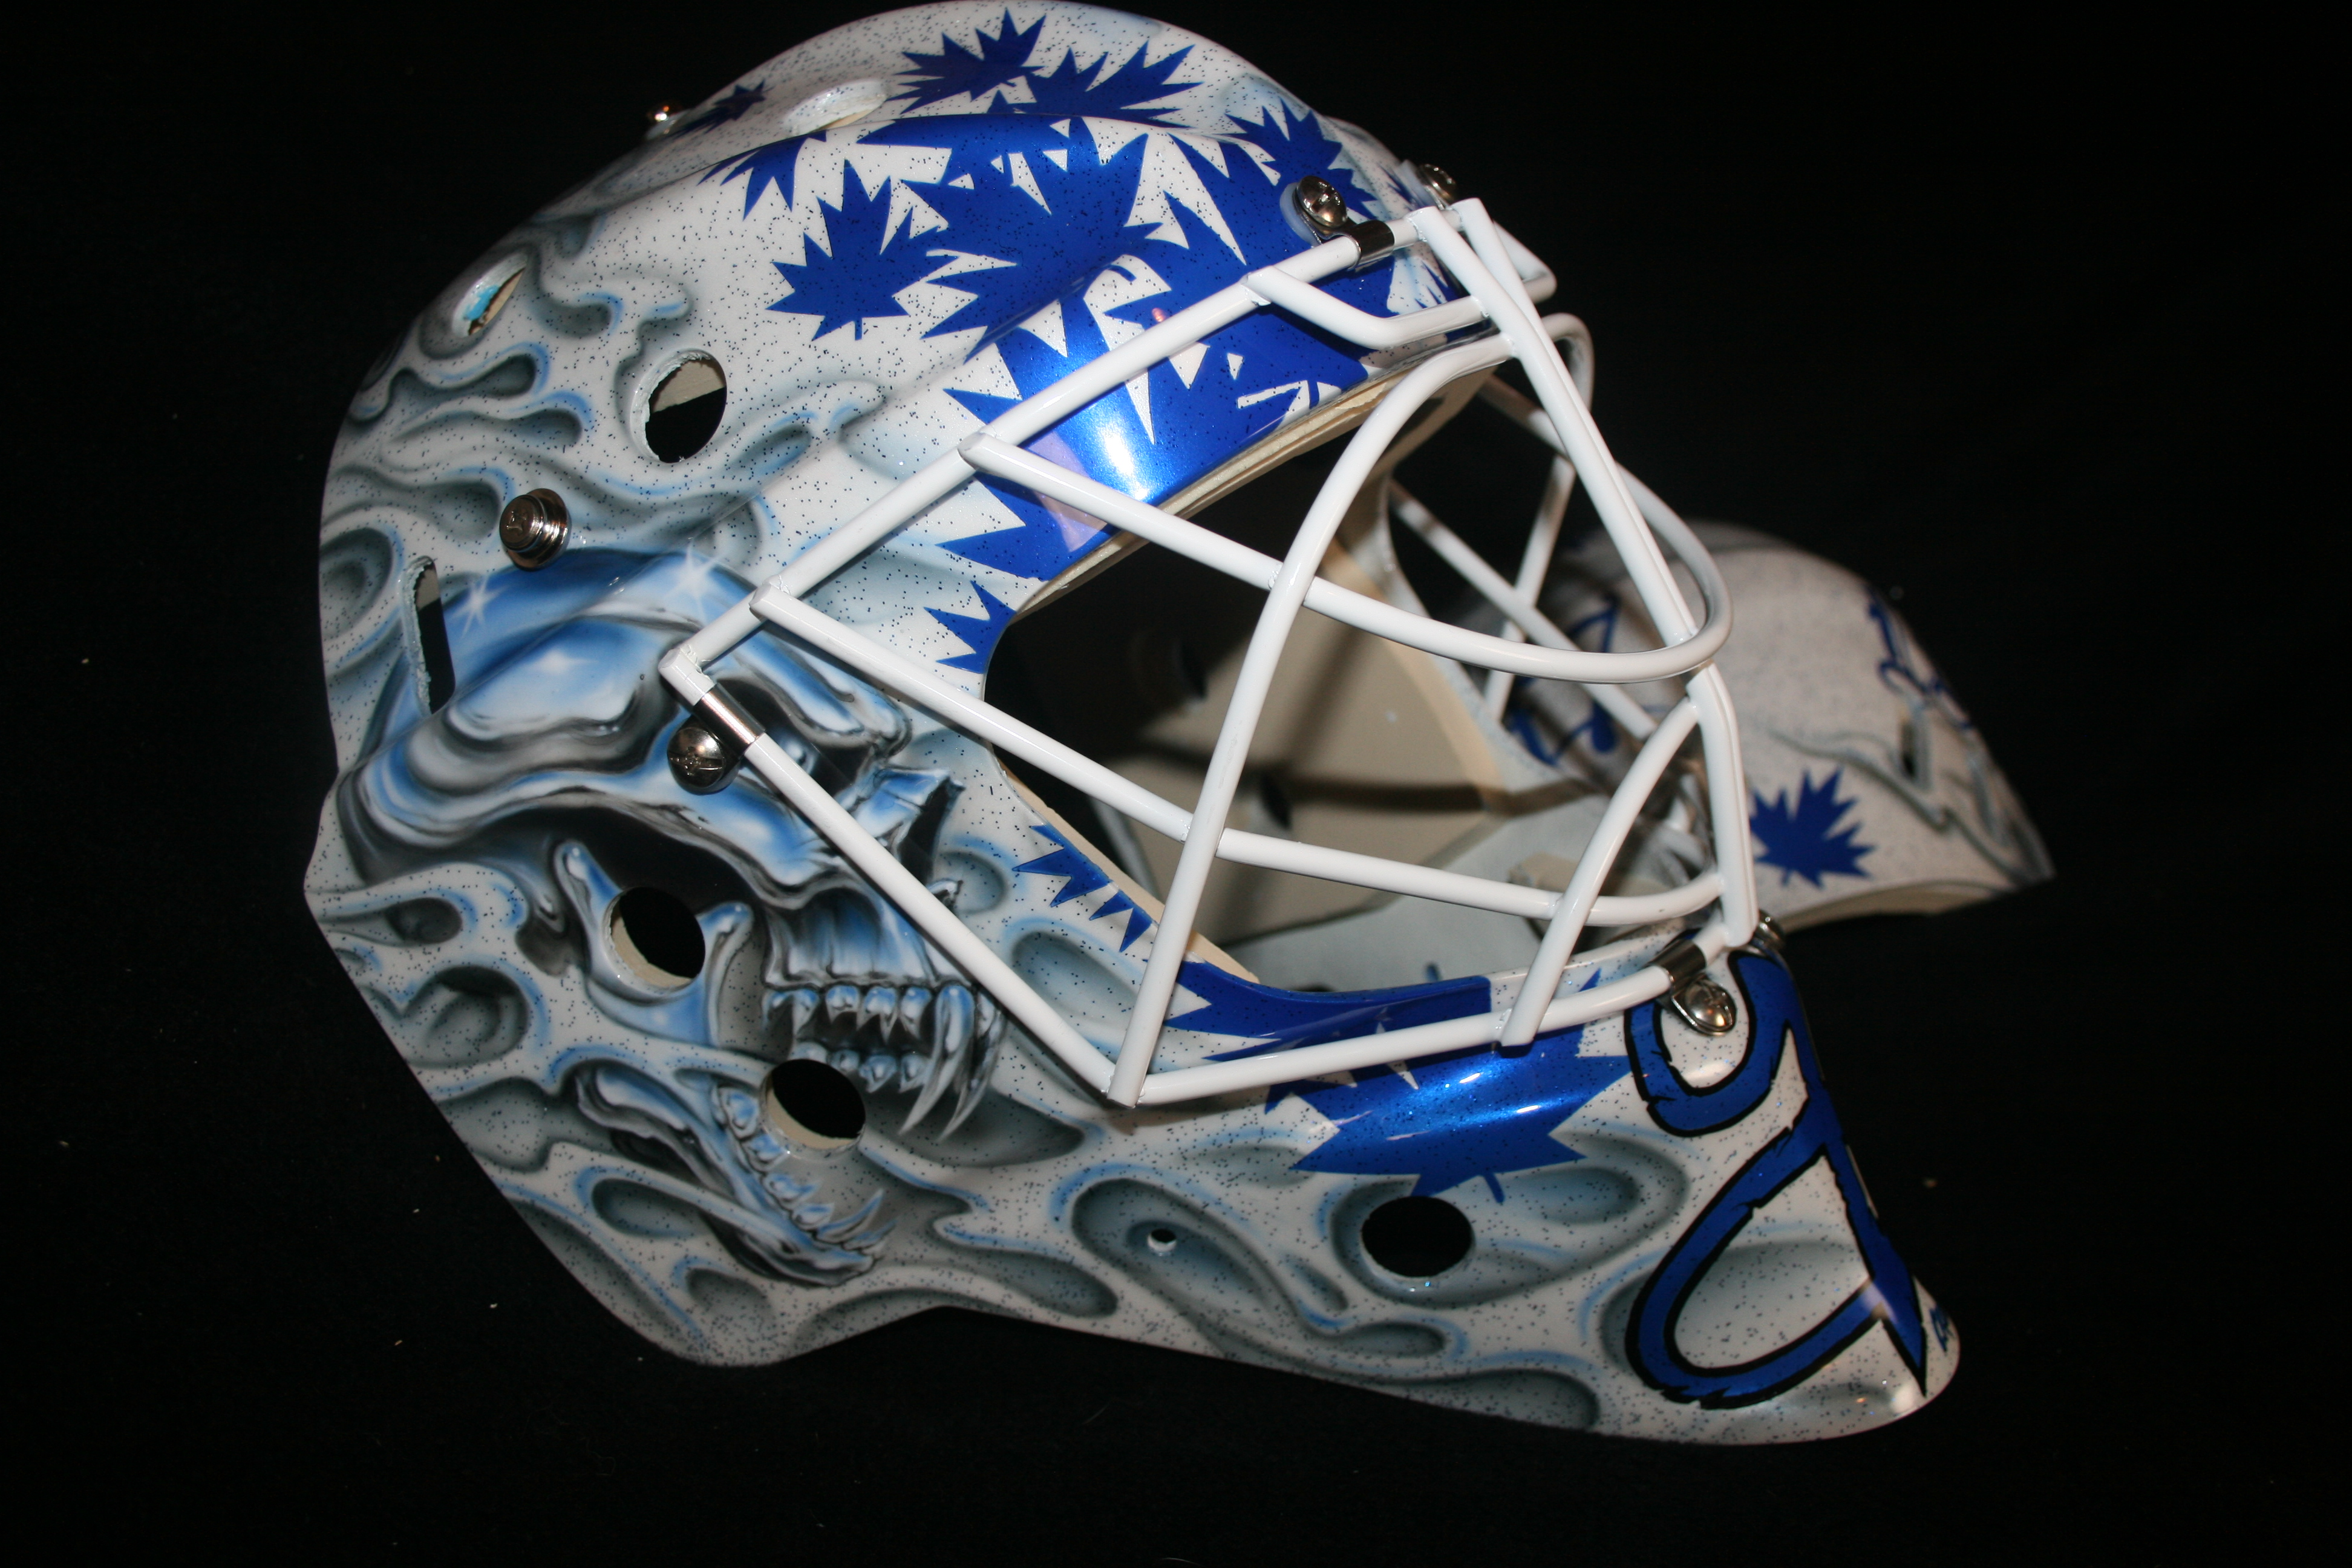 Justin Pogge Toronto Maple Leafs 2